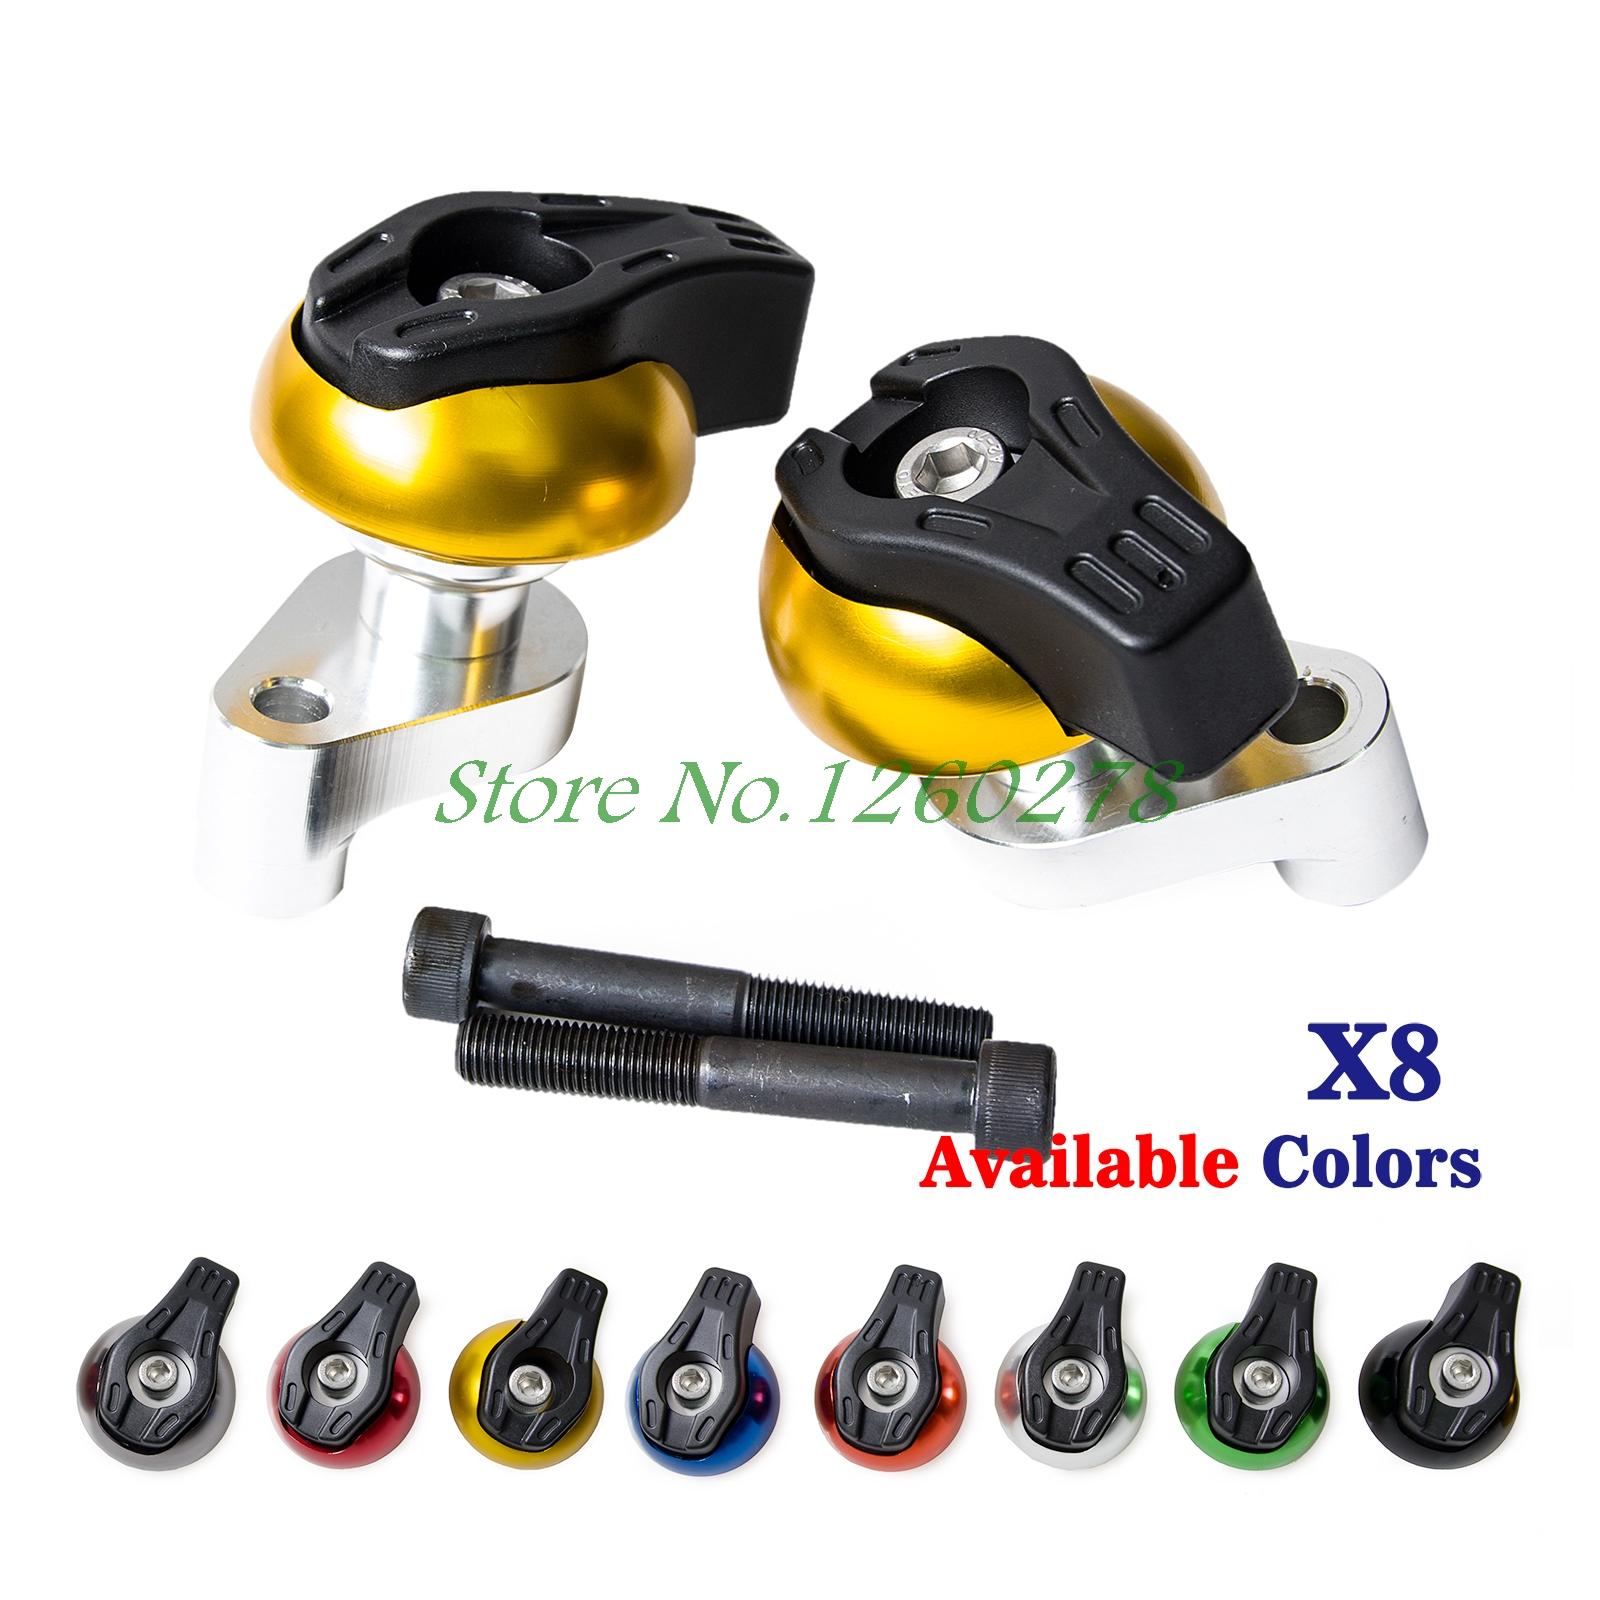 ③Motocicleta CNC Marcos protector para Suzuki gsx-r1000 gsxr1000 K7 ...